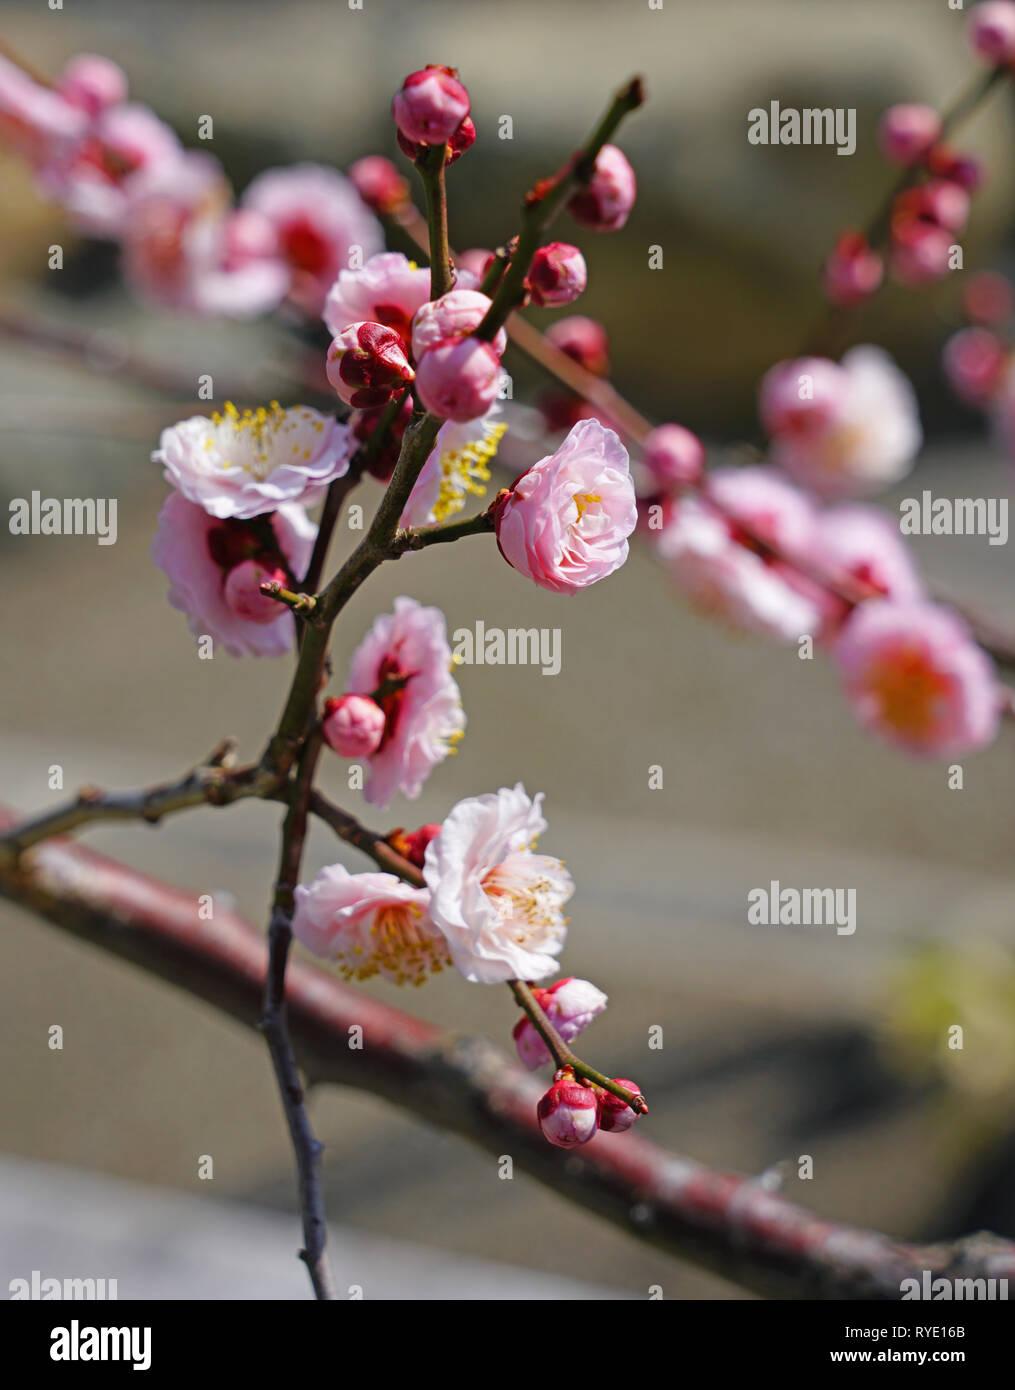 Rosa Blume blüht der Japanischen ume Aprikosenbaum, Prunus japanische Aprikose, im Winter in Japan Stockbild